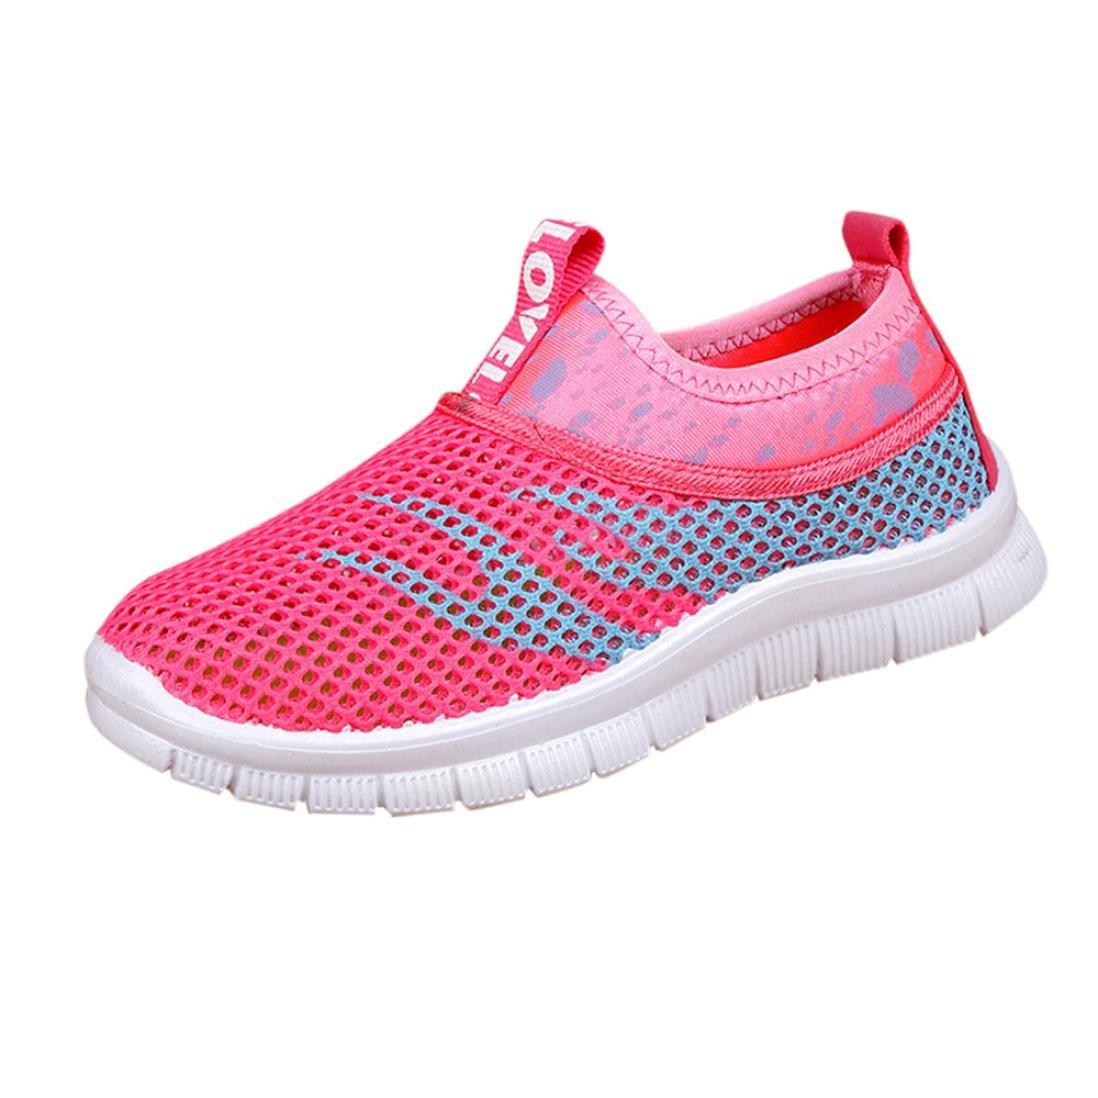 31bd275694265 Amazon.com: Moonper Children Kids Boy Girl Sport Sneakers Casual ...